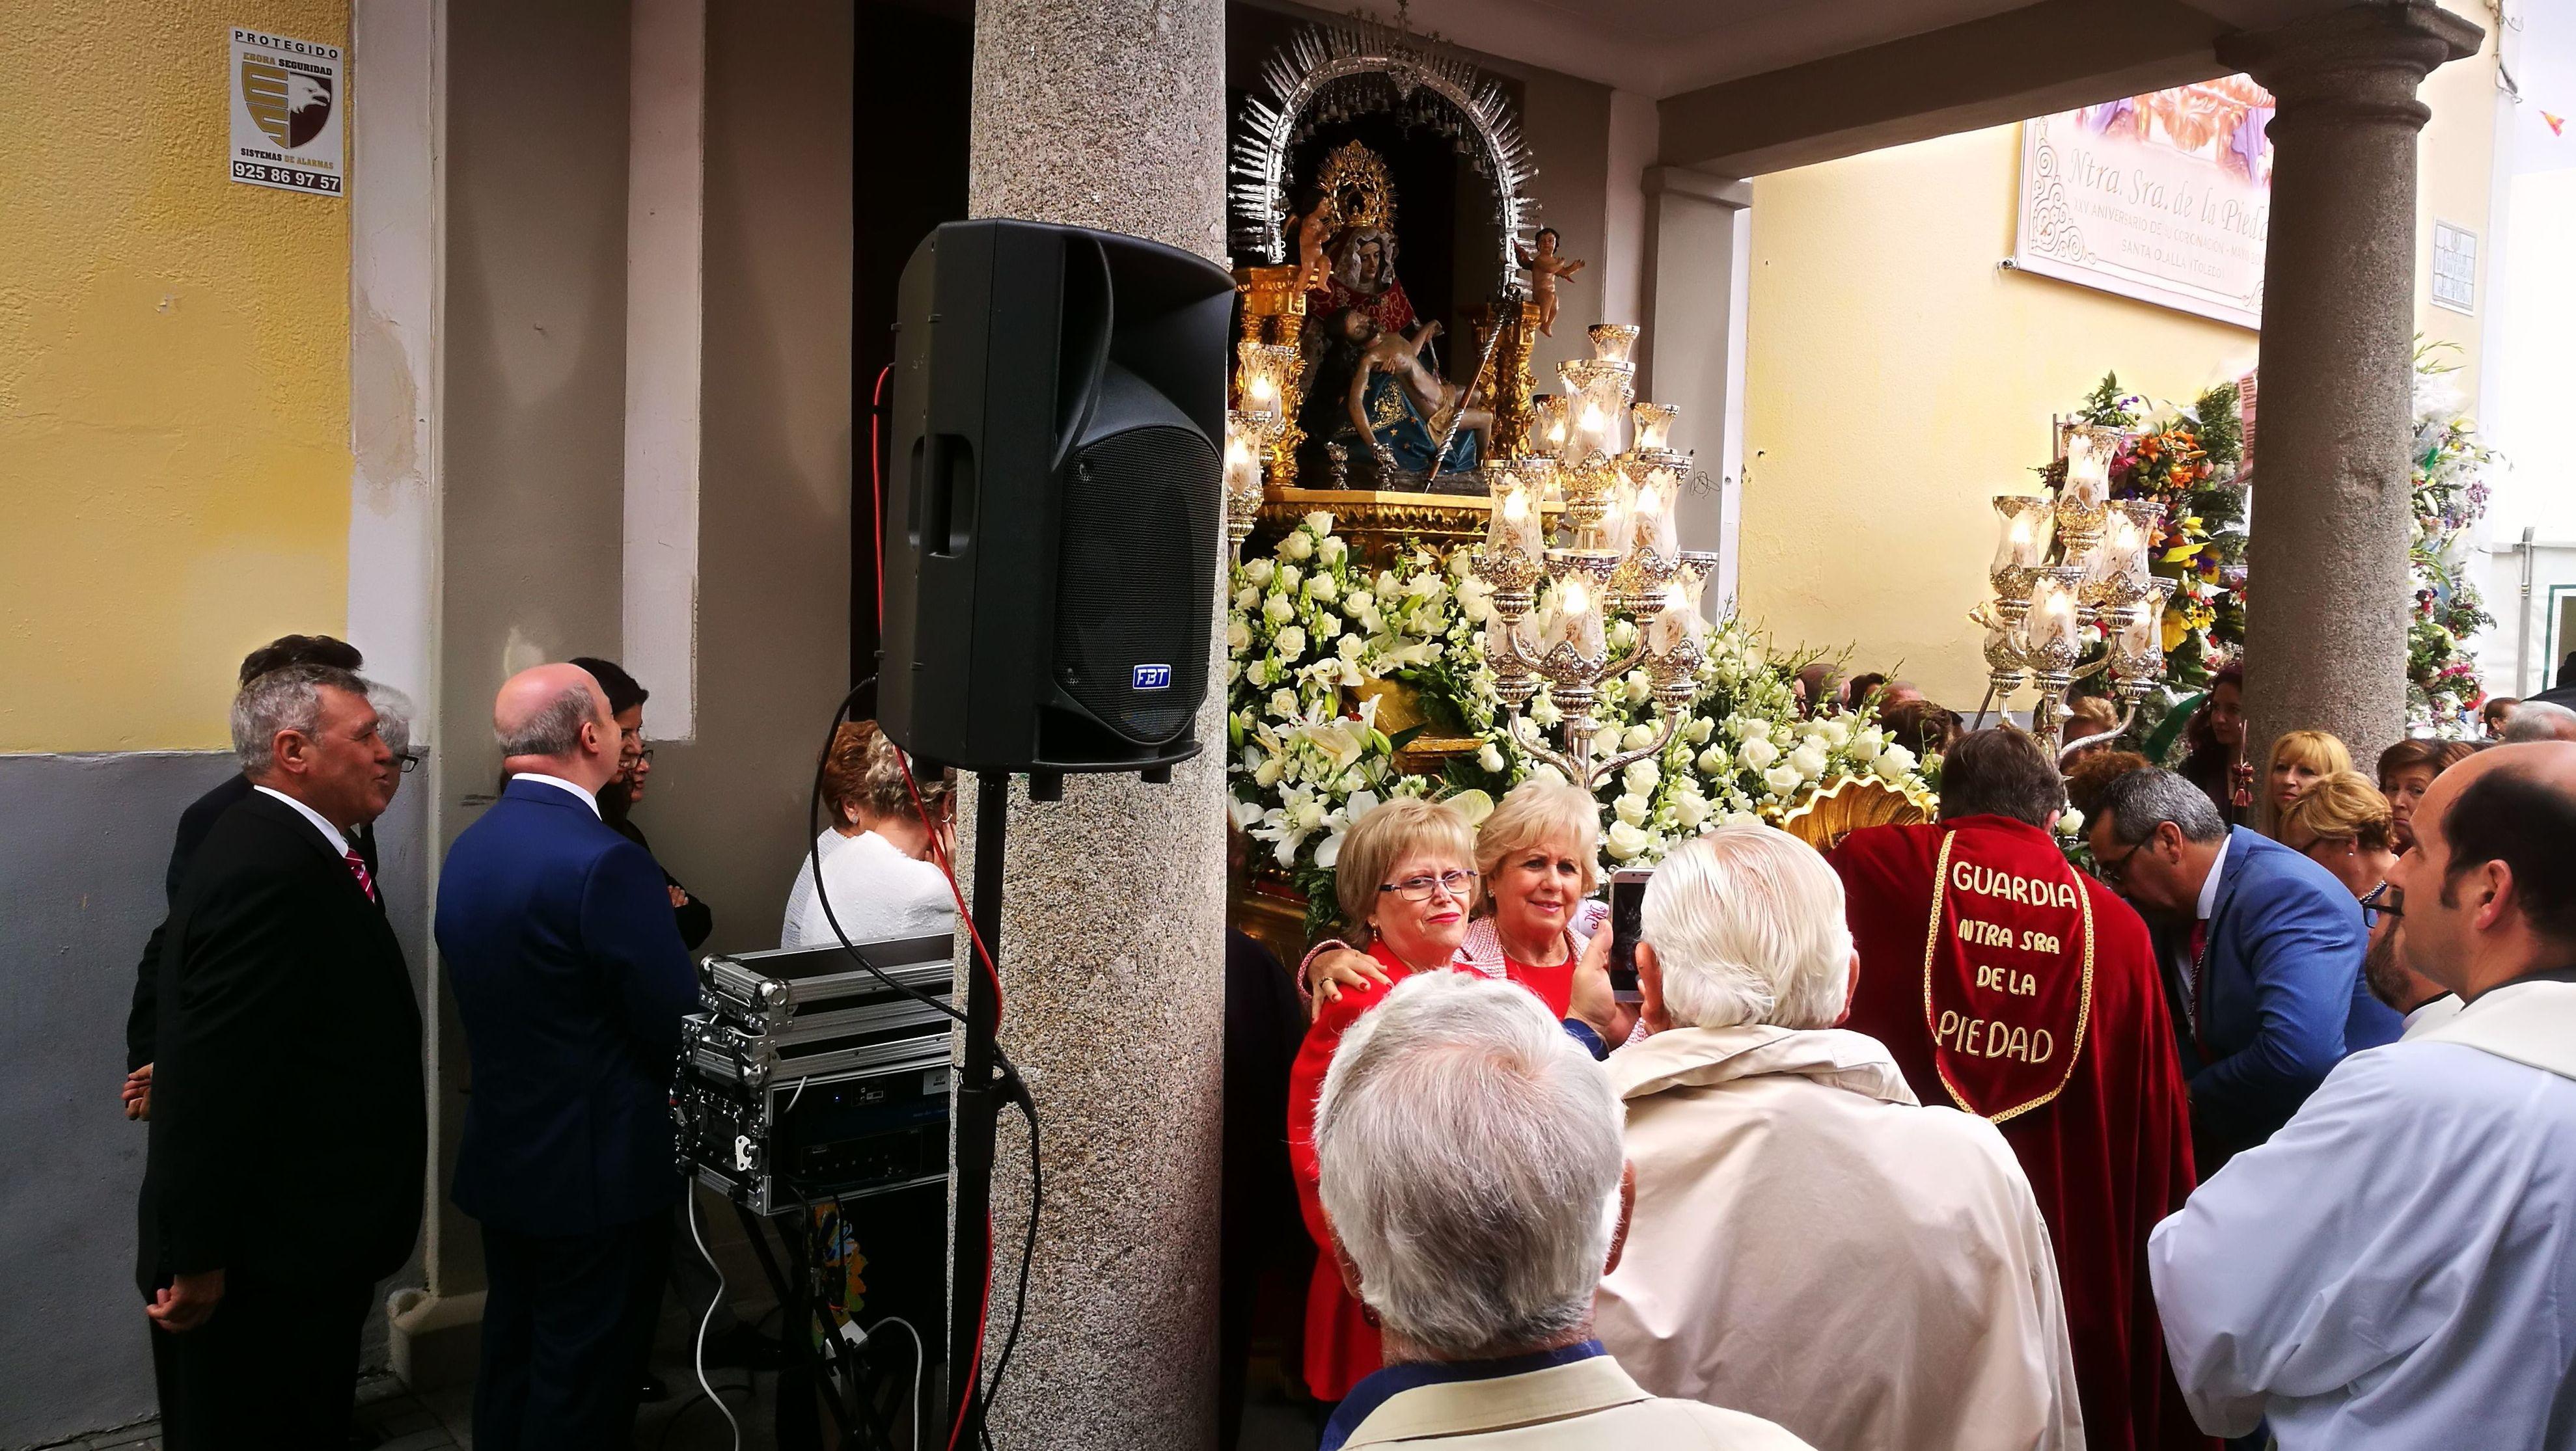 Sonorizacion de evento religioso